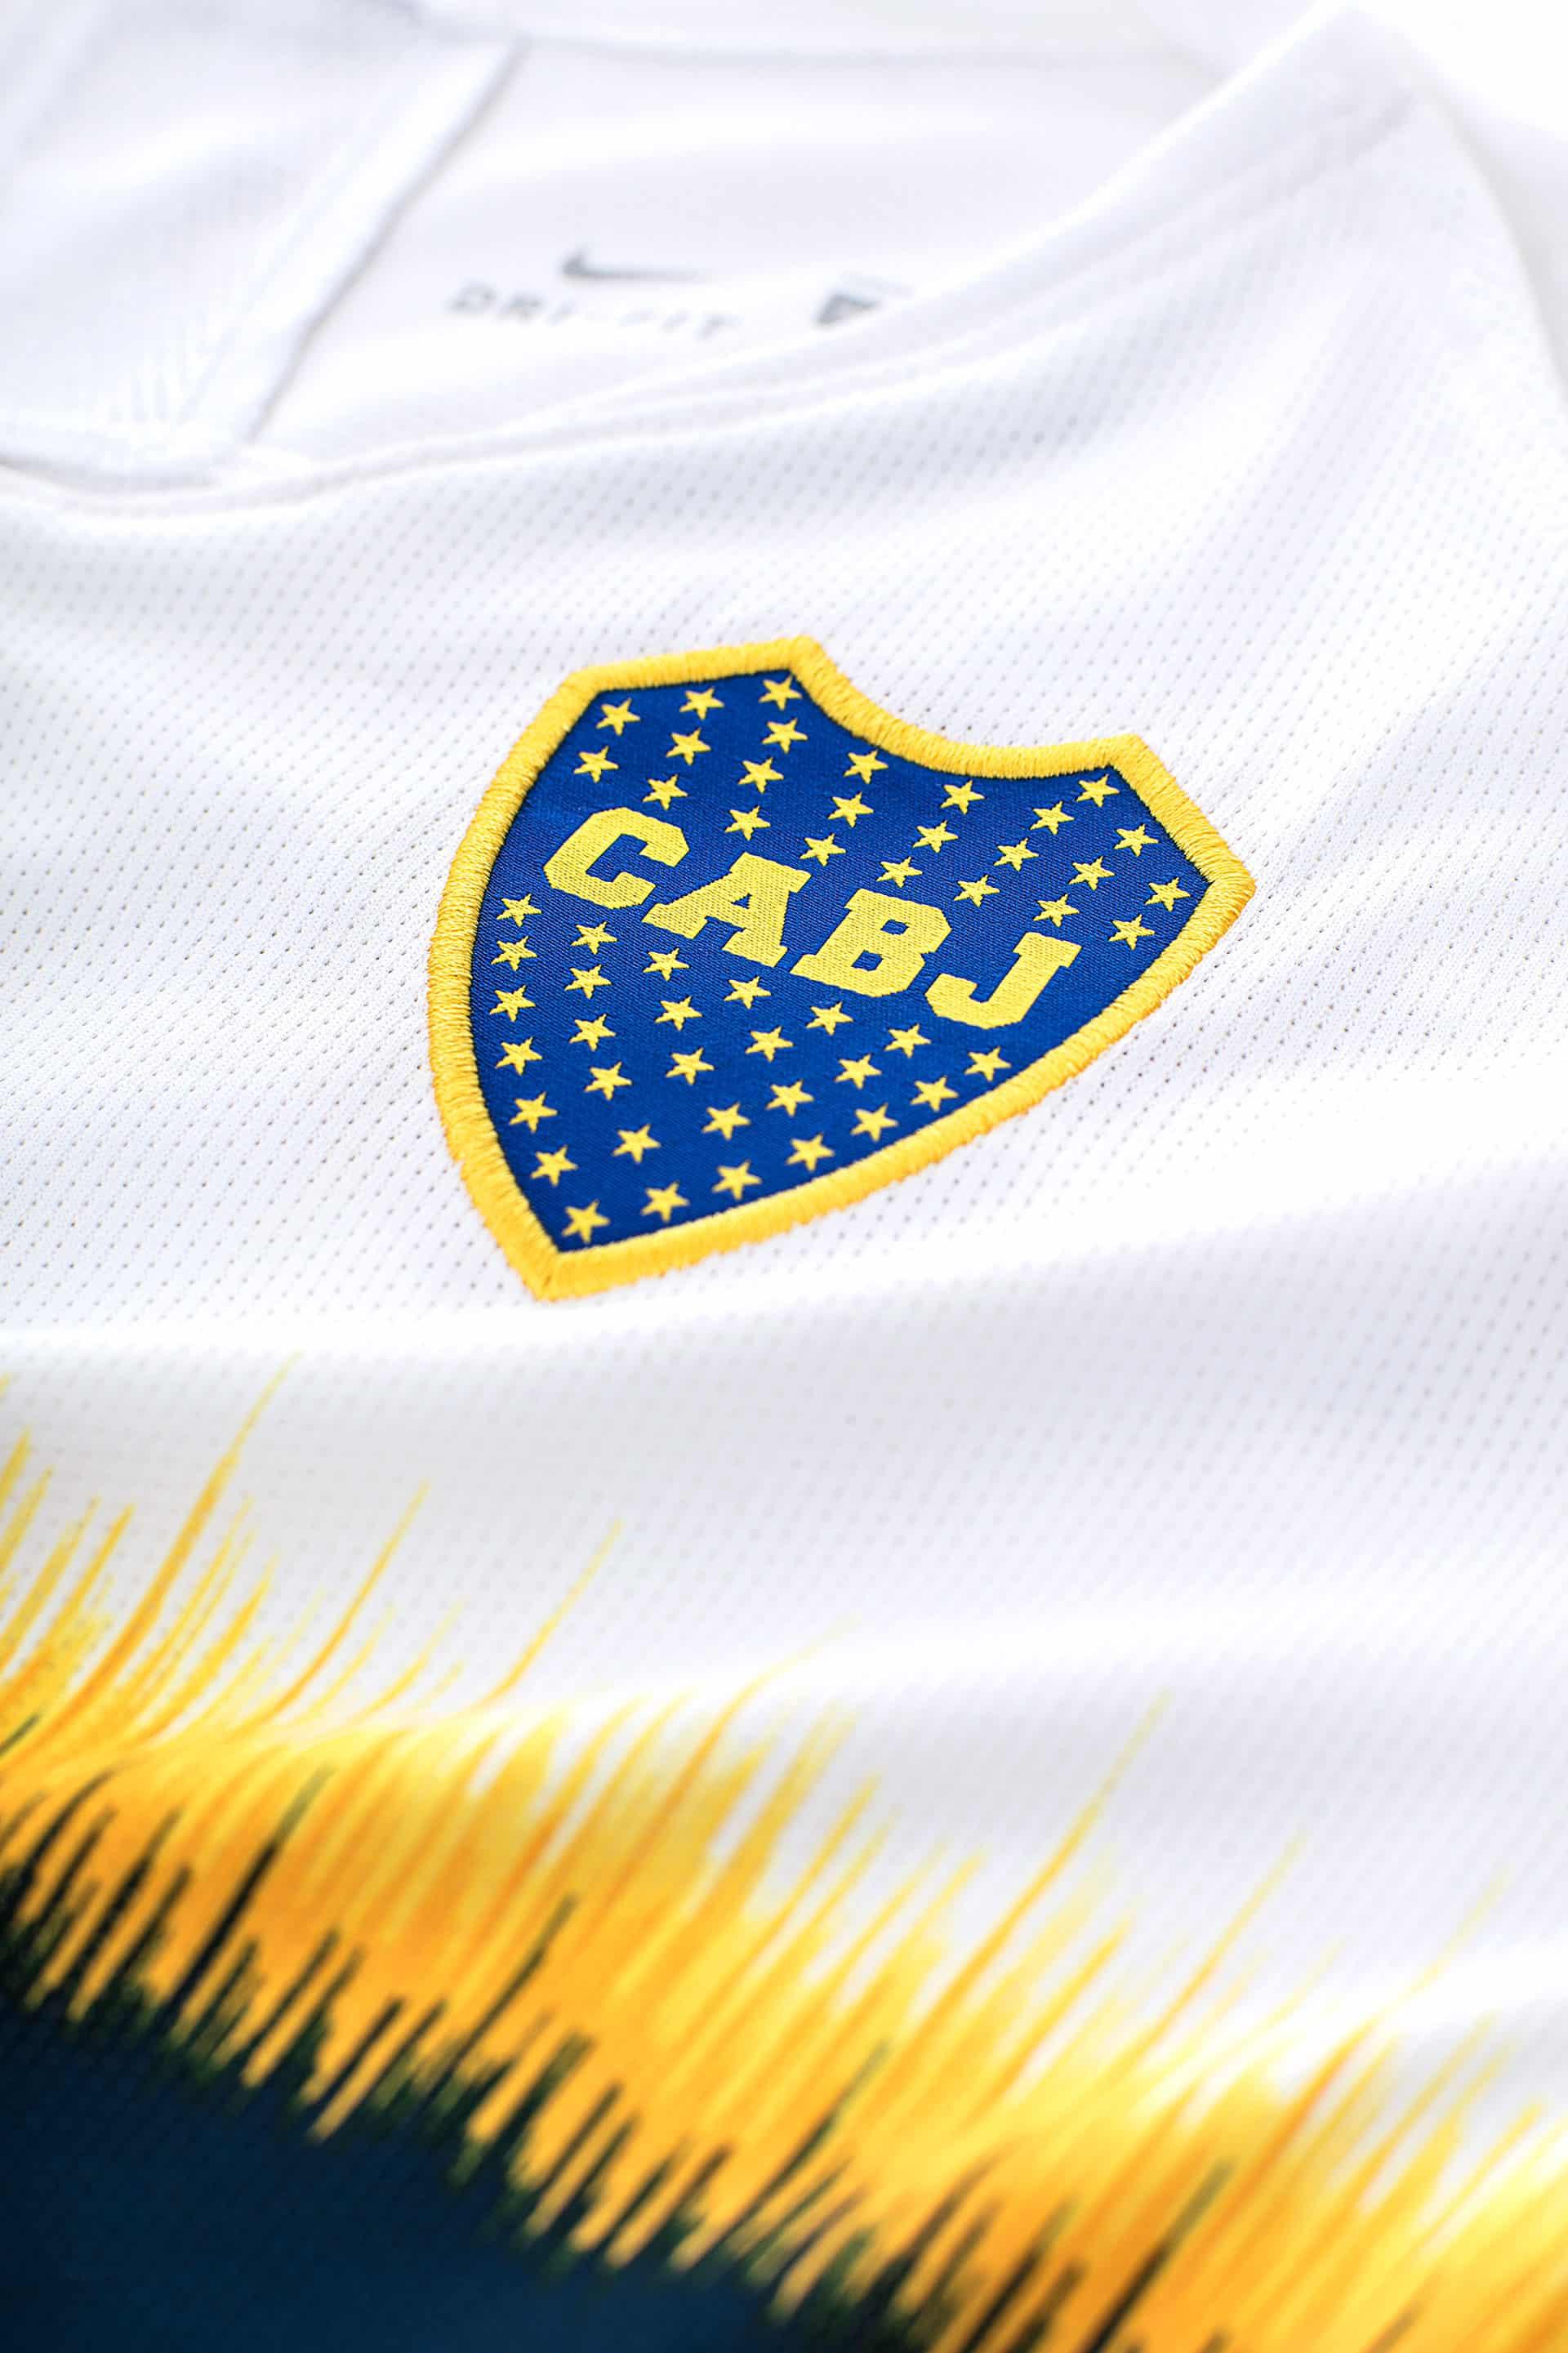 maillot-boca-juniors-exterieur-2018-2019